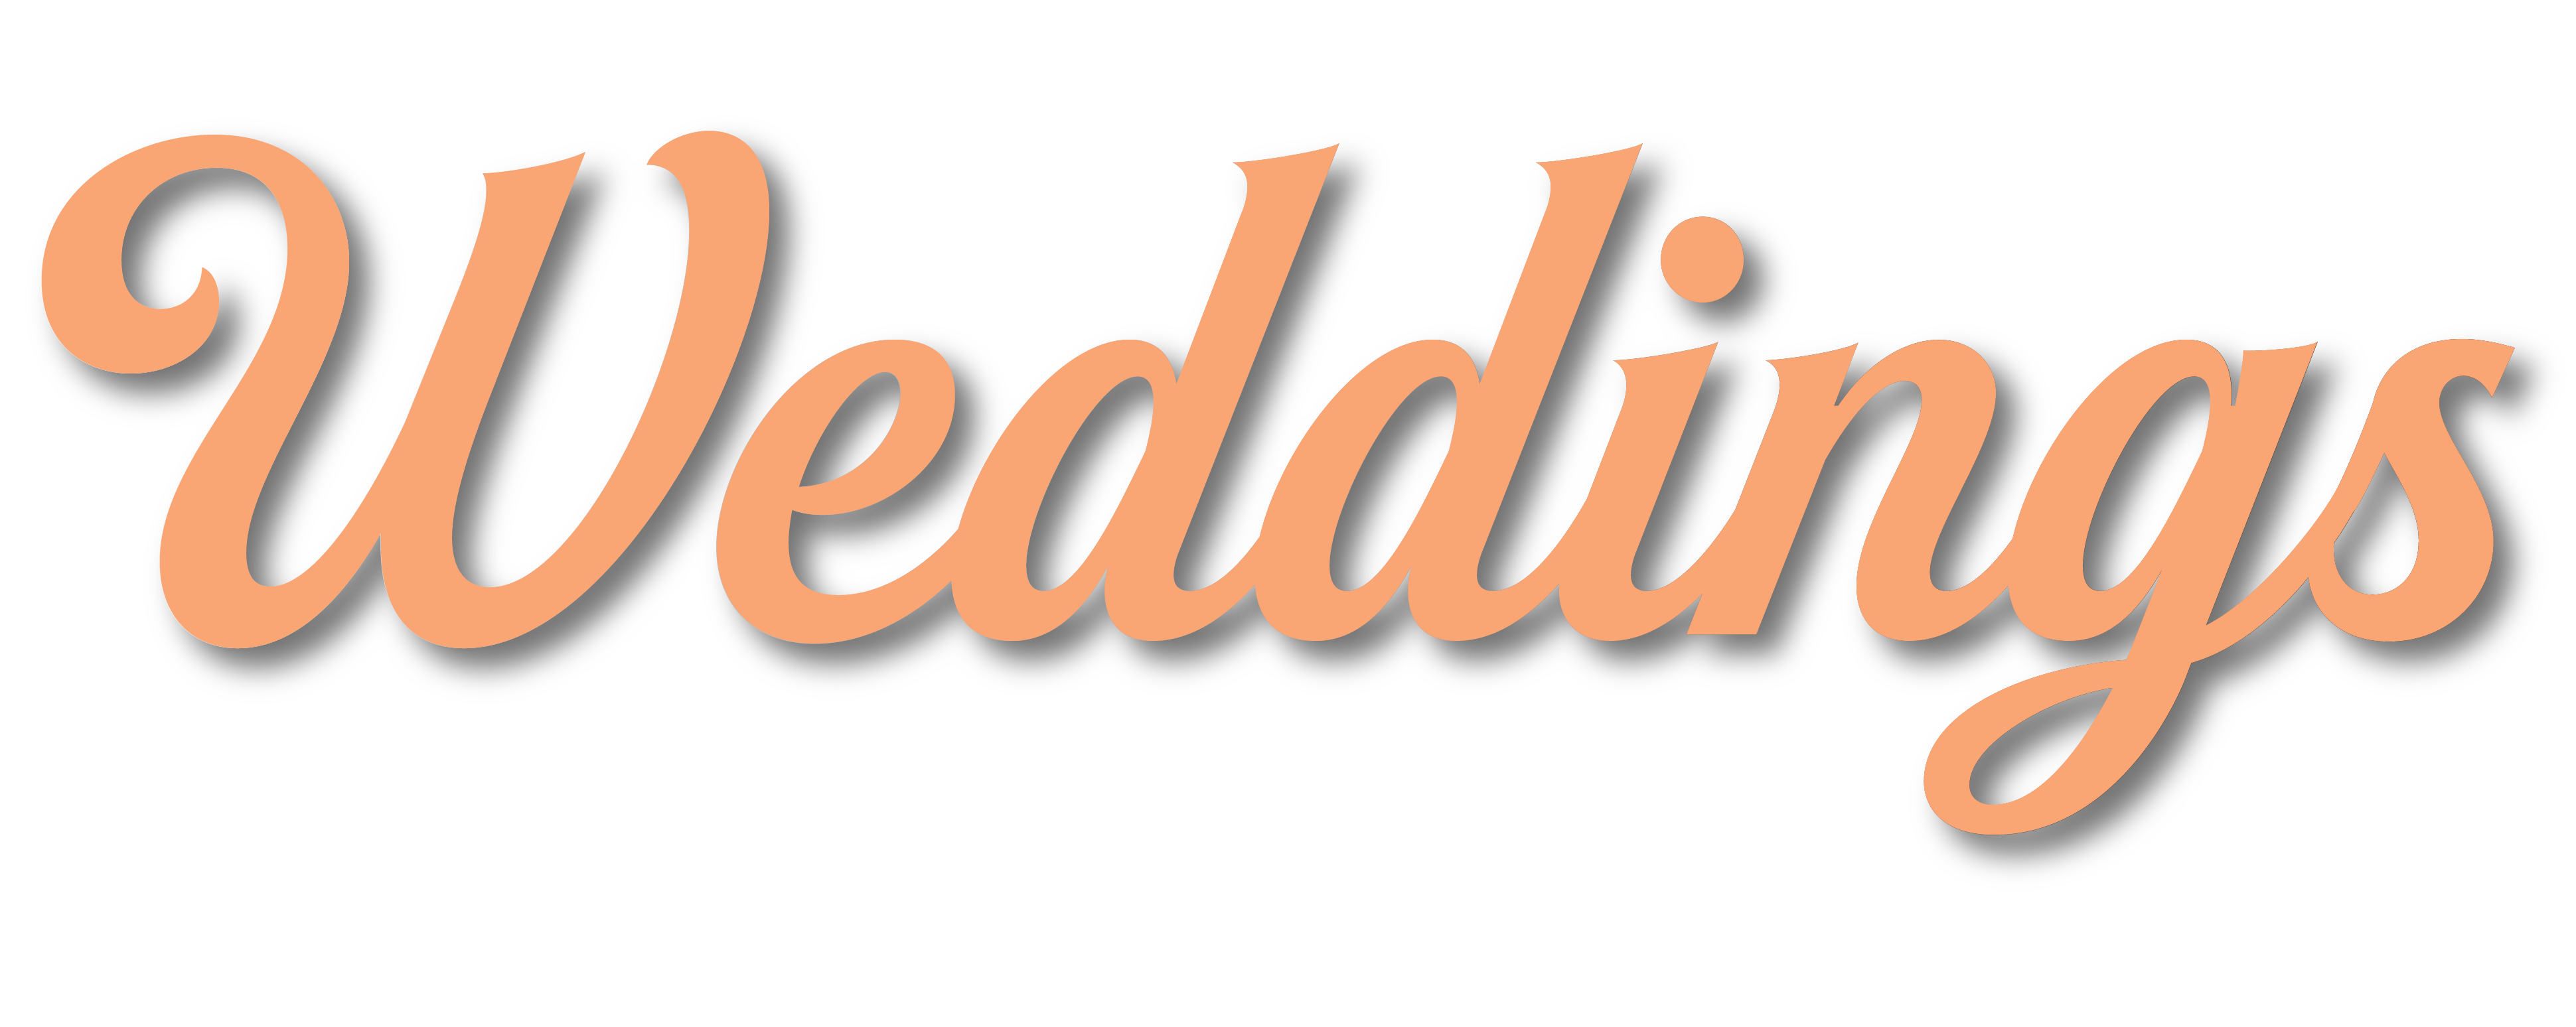 Wedding graphic title